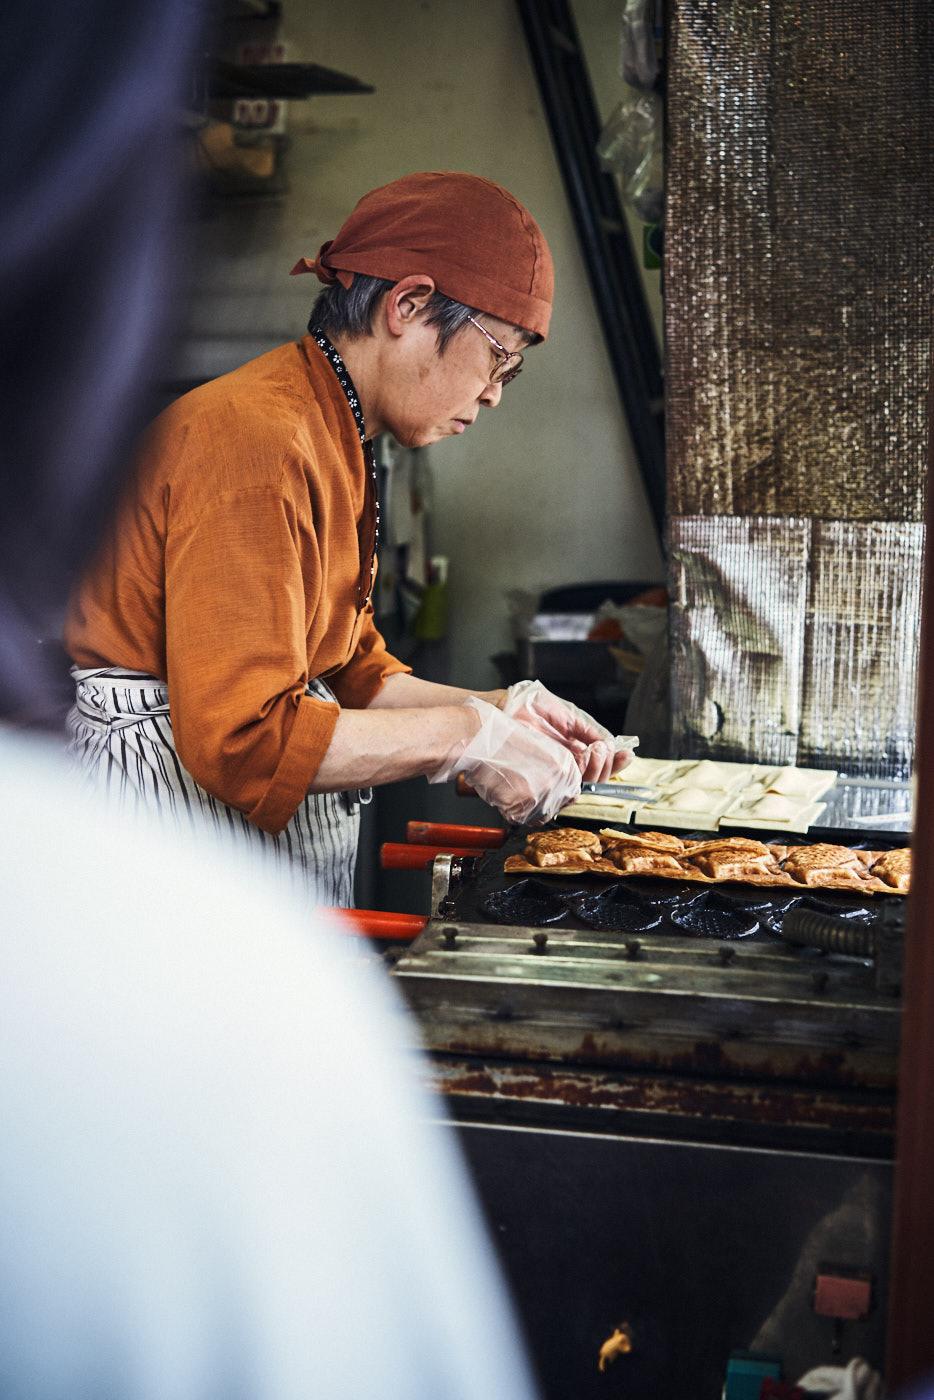 japan_2018_osaka_raw 171_klein.jpg